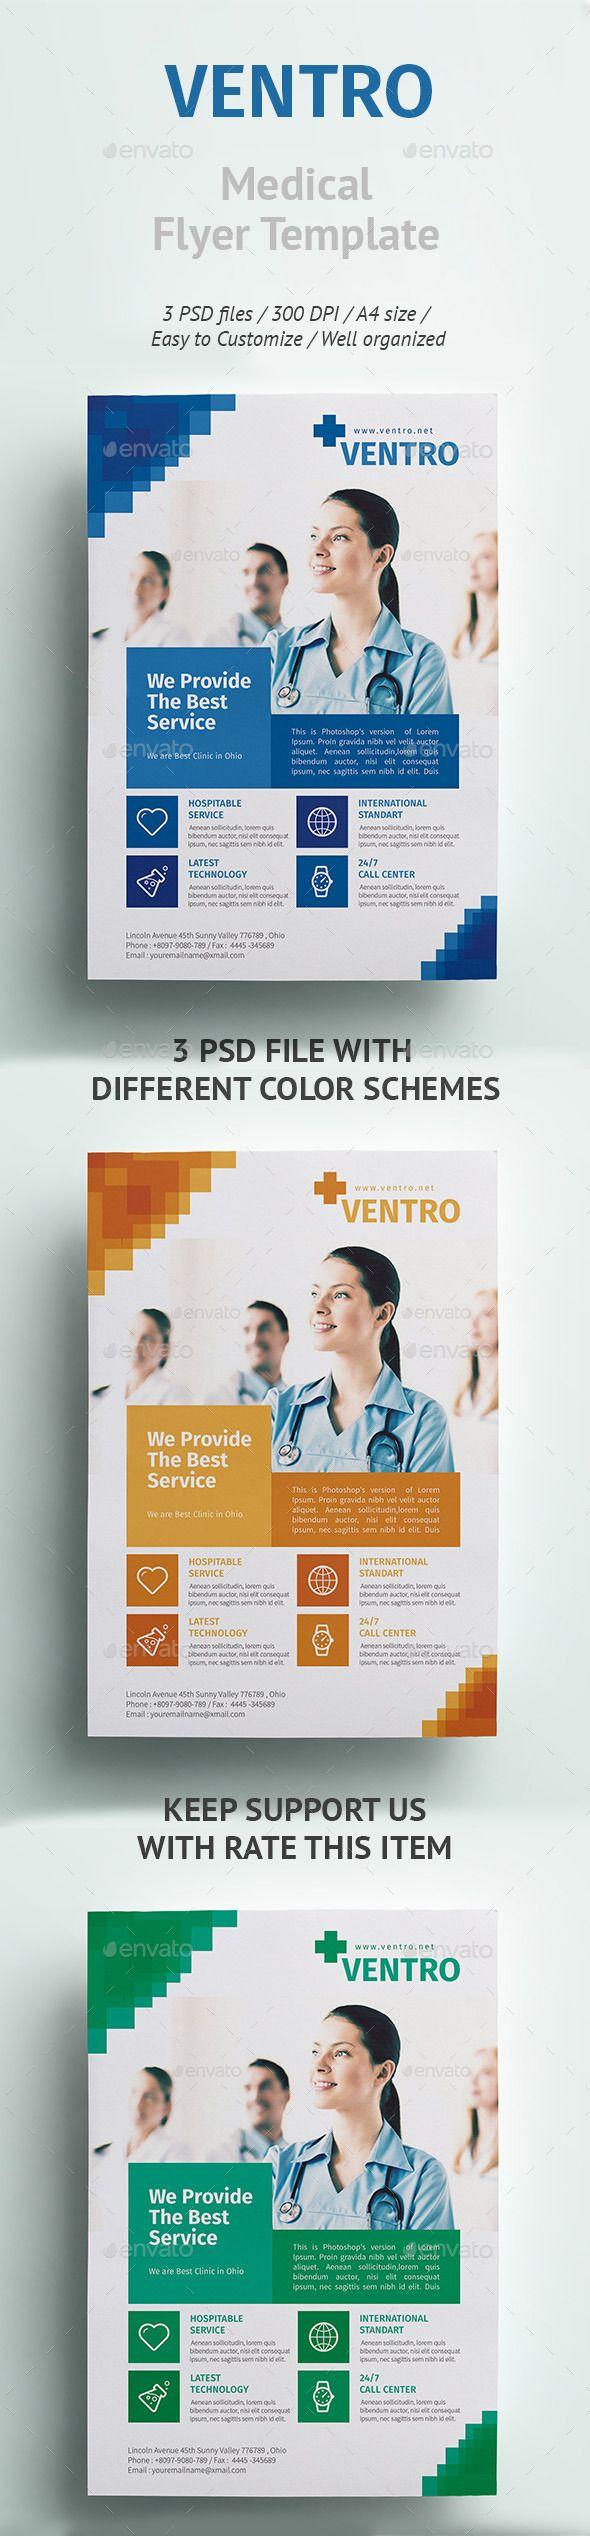 best images about flyer design psd flyer ventro medical flyer template